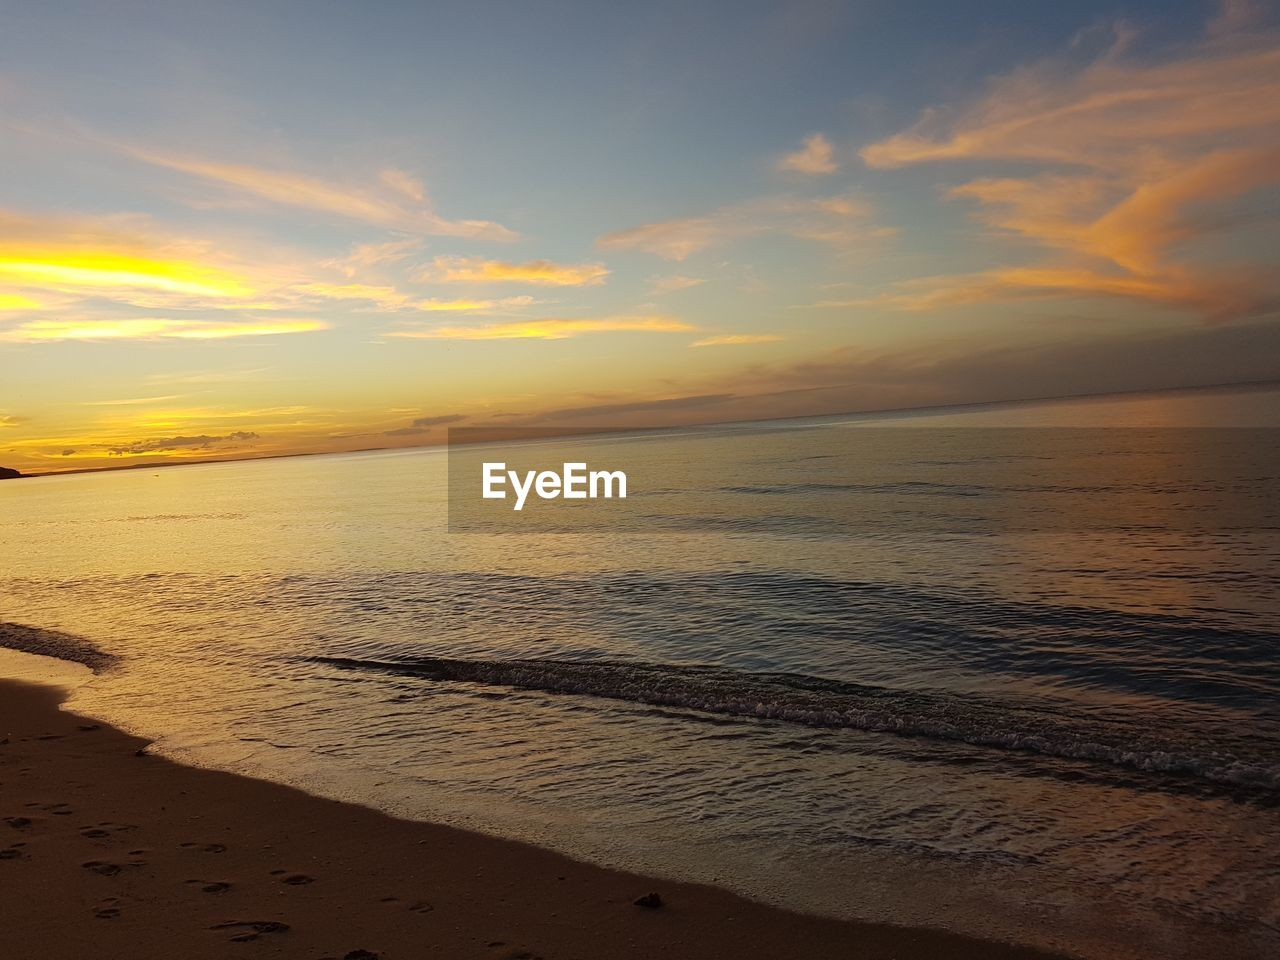 sunset, sky, sea, scenics - nature, beach, water, beauty in nature, land, horizon over water, cloud - sky, horizon, tranquility, orange color, tranquil scene, idyllic, sand, nature, non-urban scene, no people, outdoors